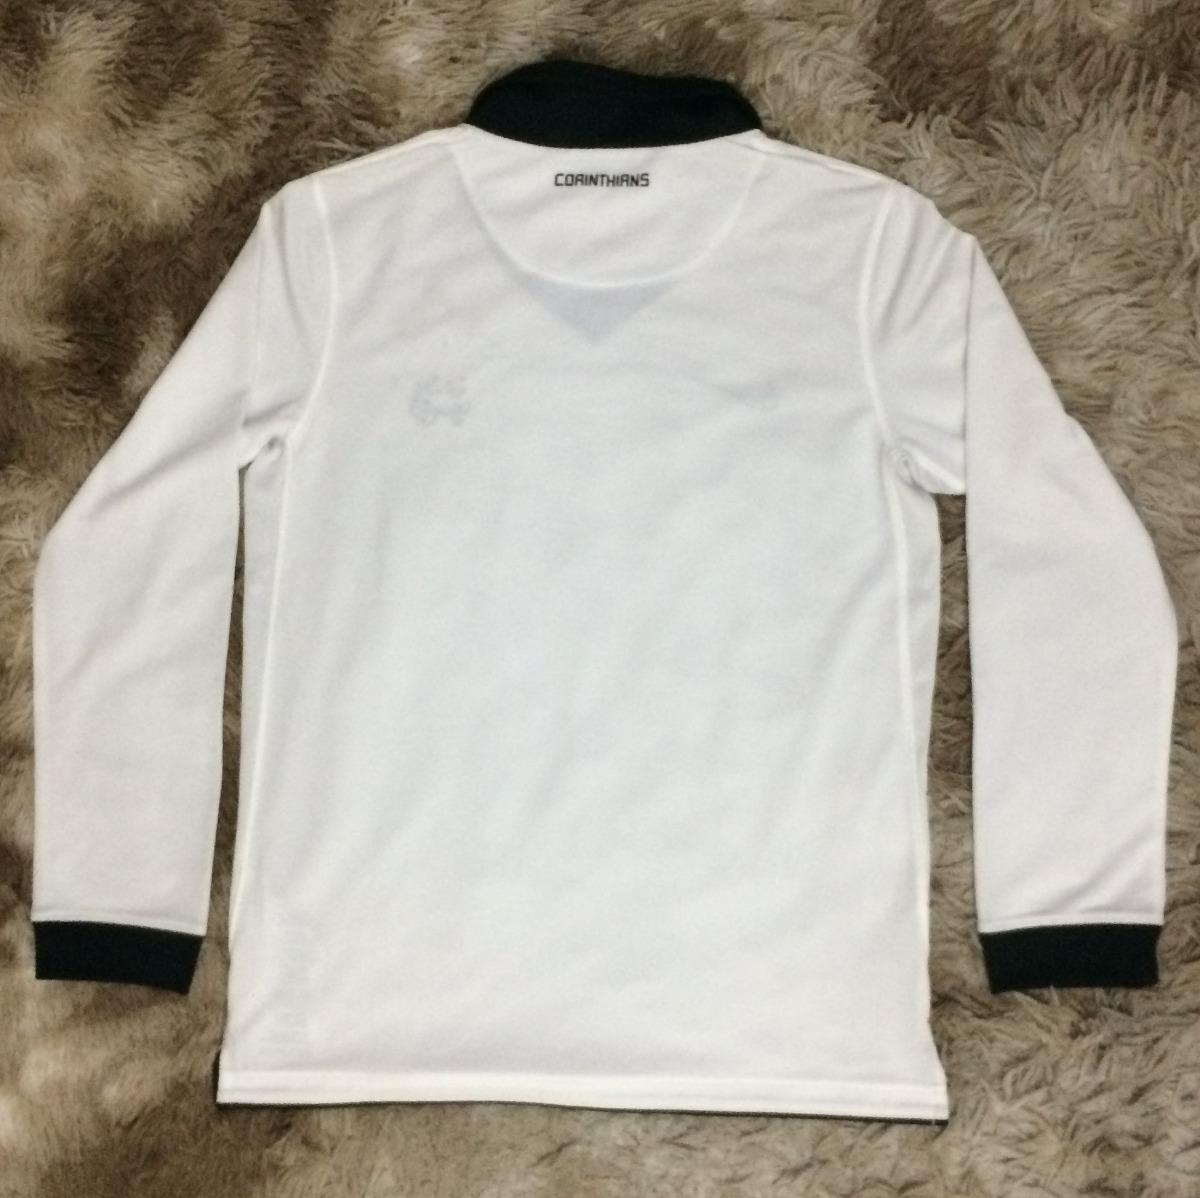 f20a2d385300b camisa manga longa corinthians oficial nike infantil. Carregando zoom.